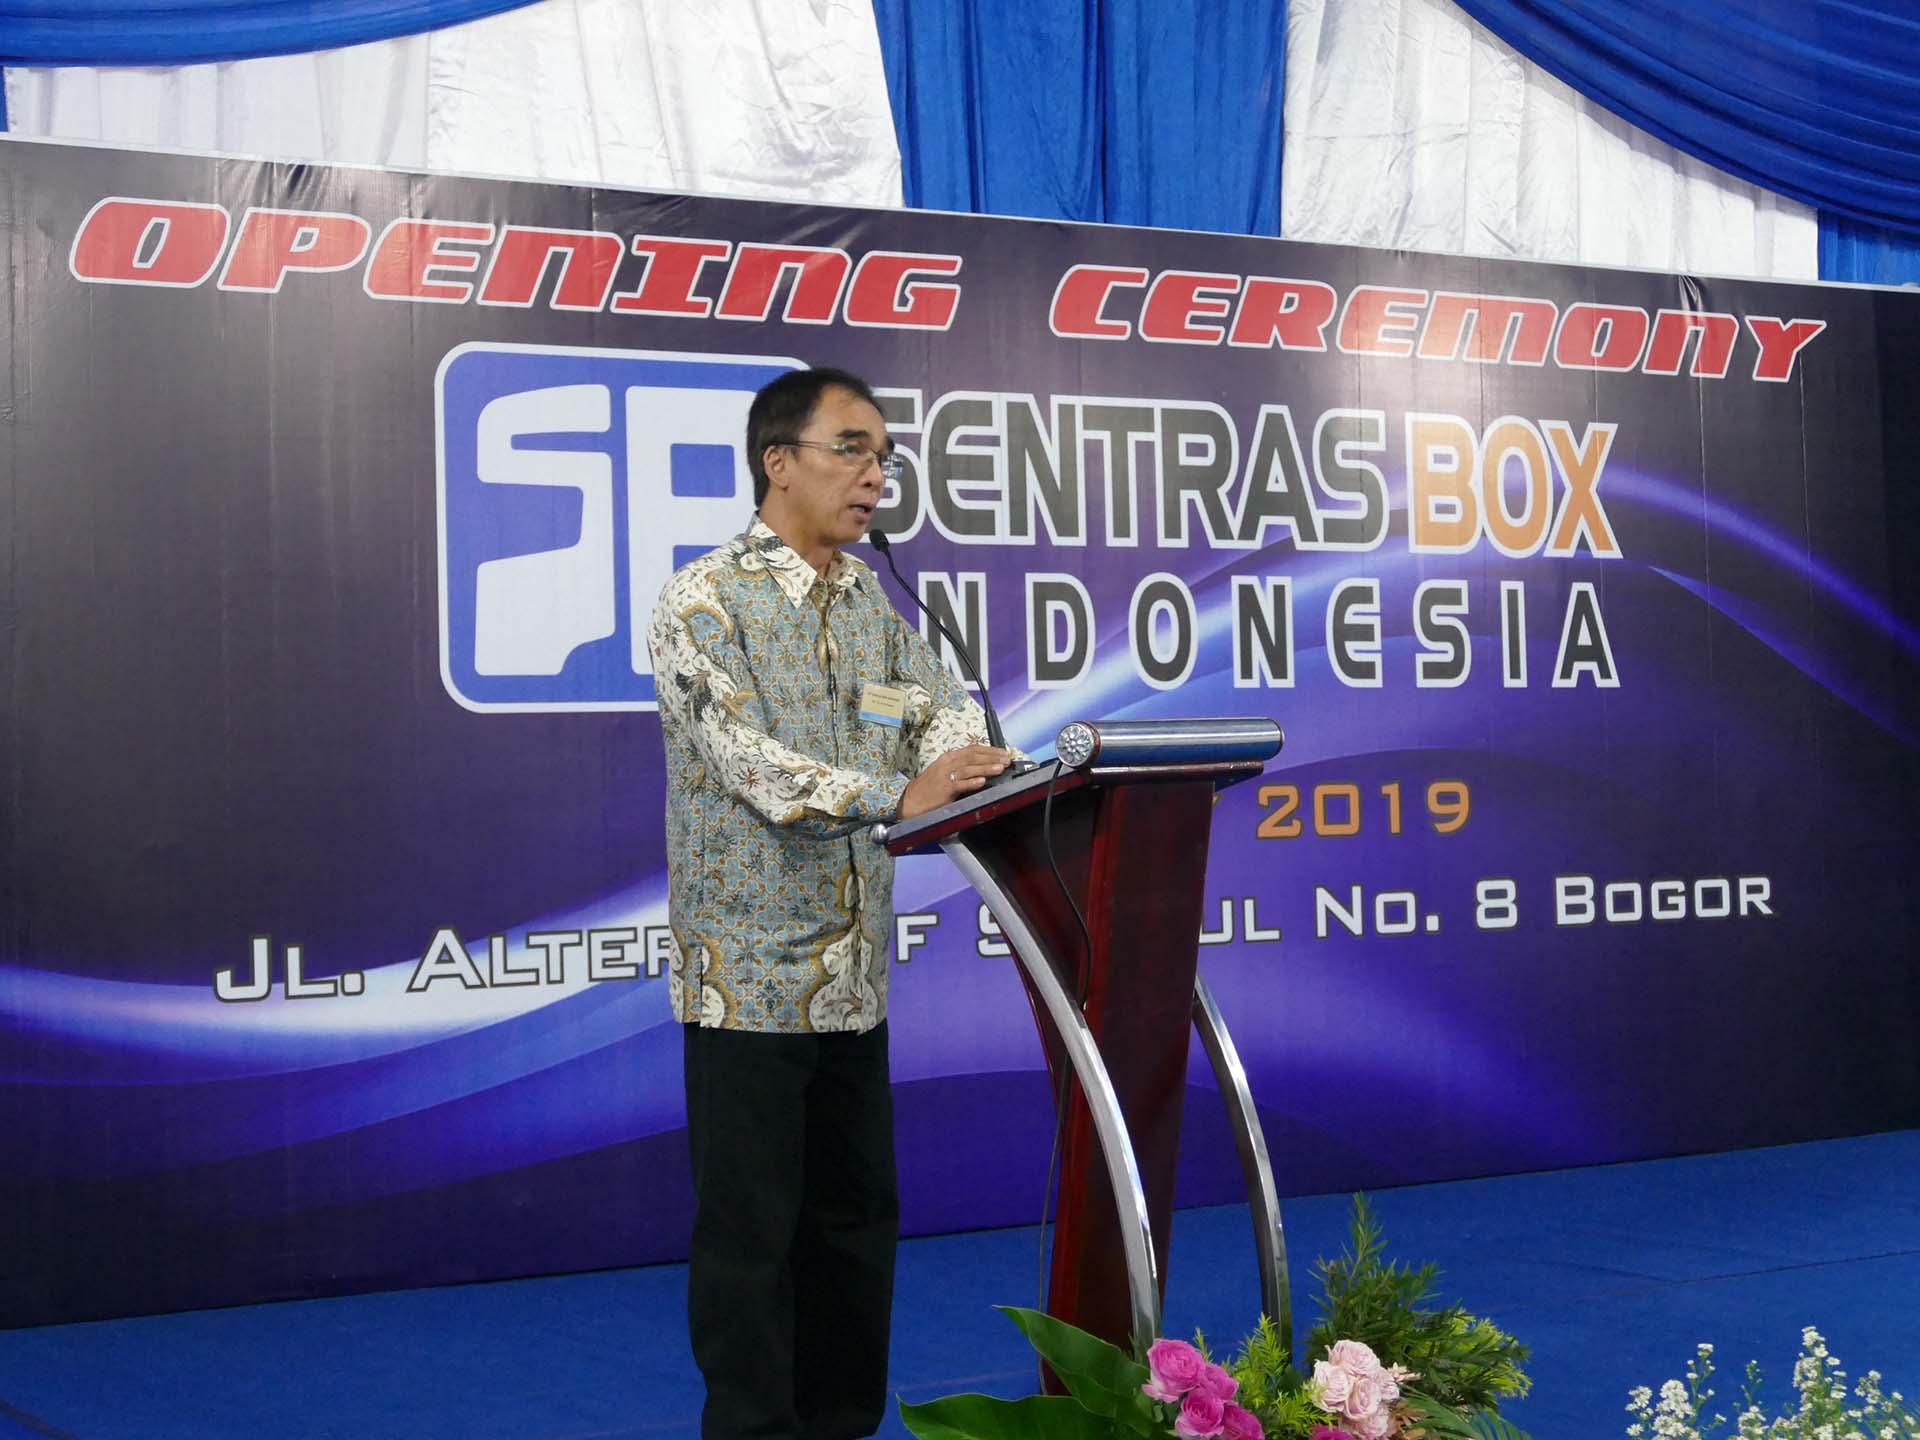 PT Sentras Box Indonesia